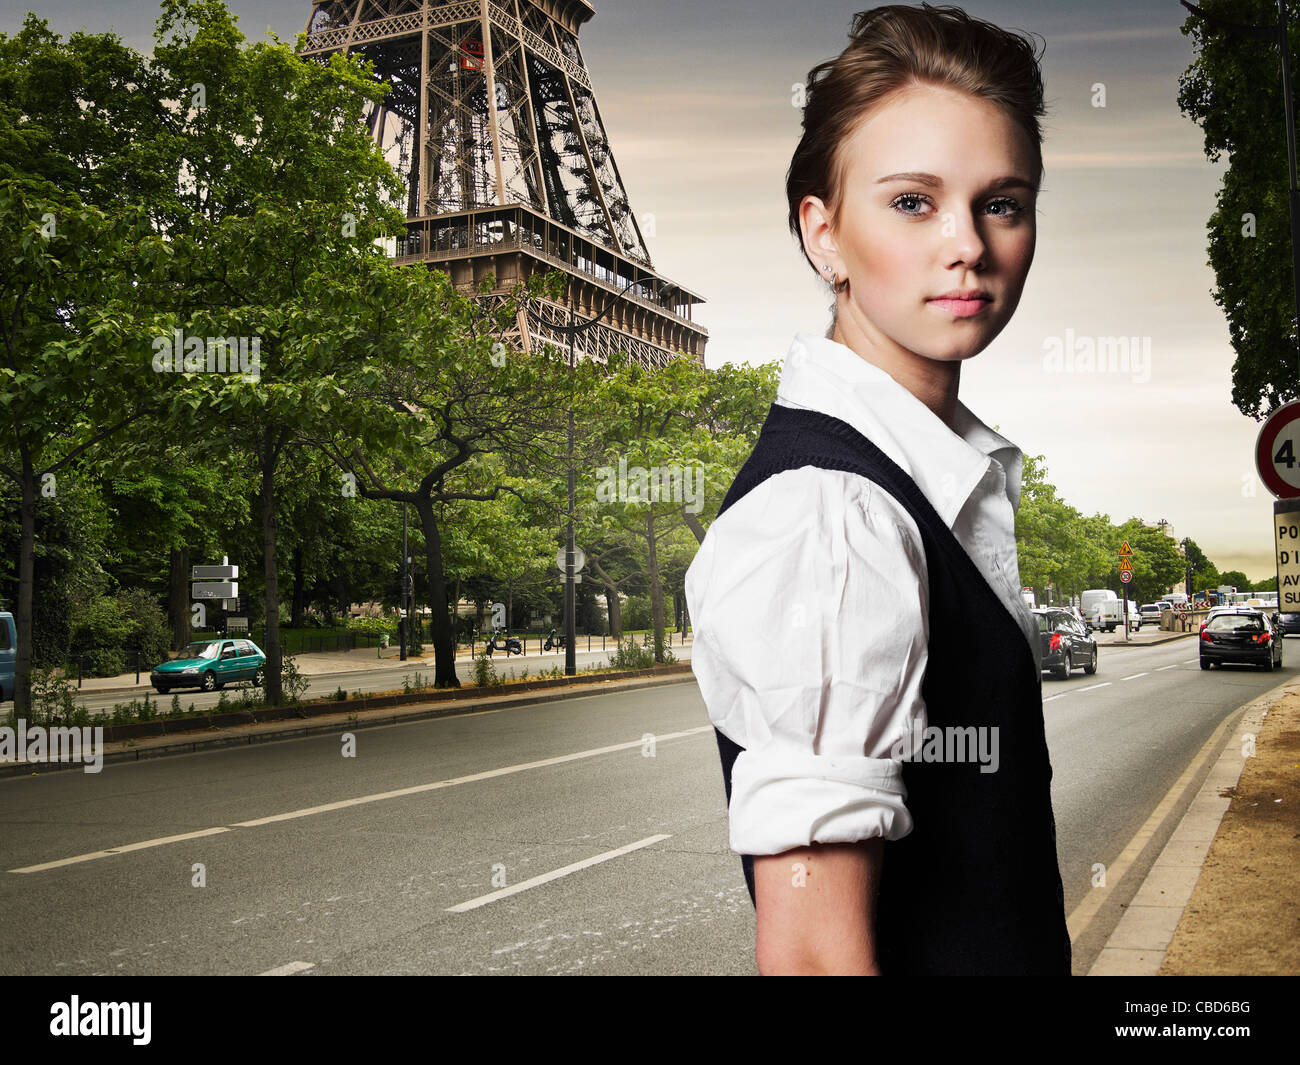 Woman walking on city street - Stock Photo